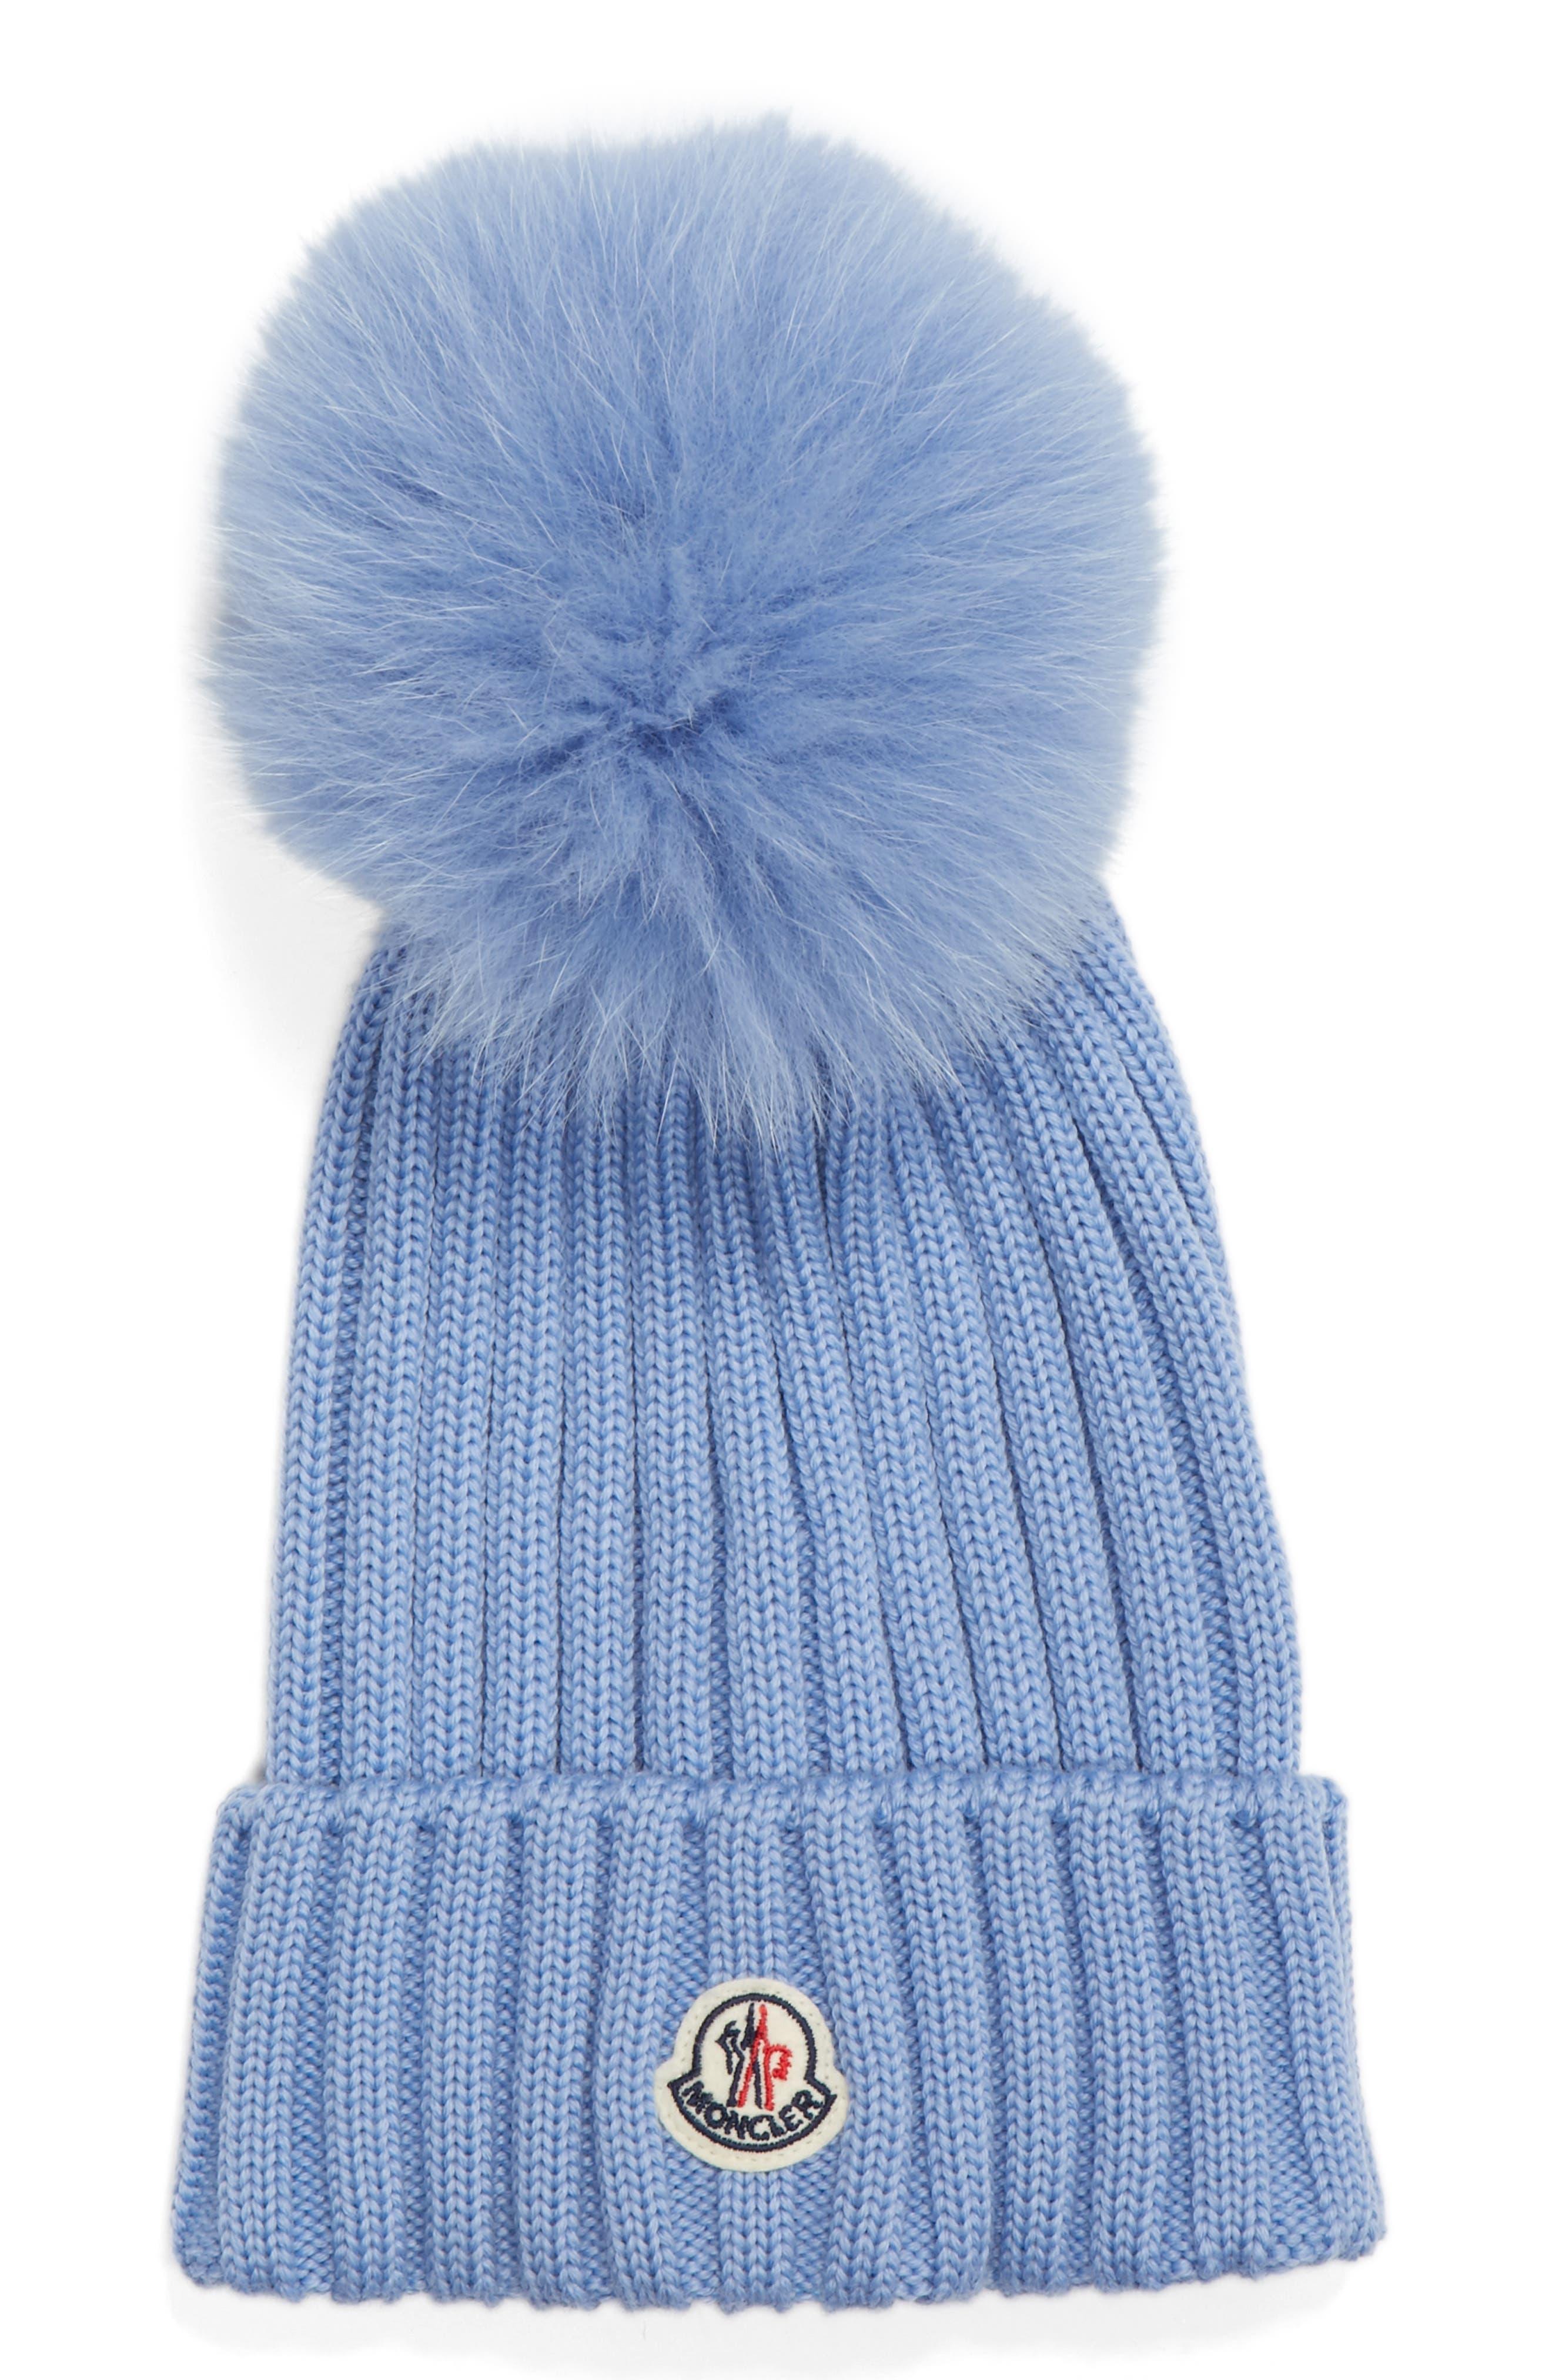 Moncler Genuine Fox Fur Pom Wool Beanie - Blue